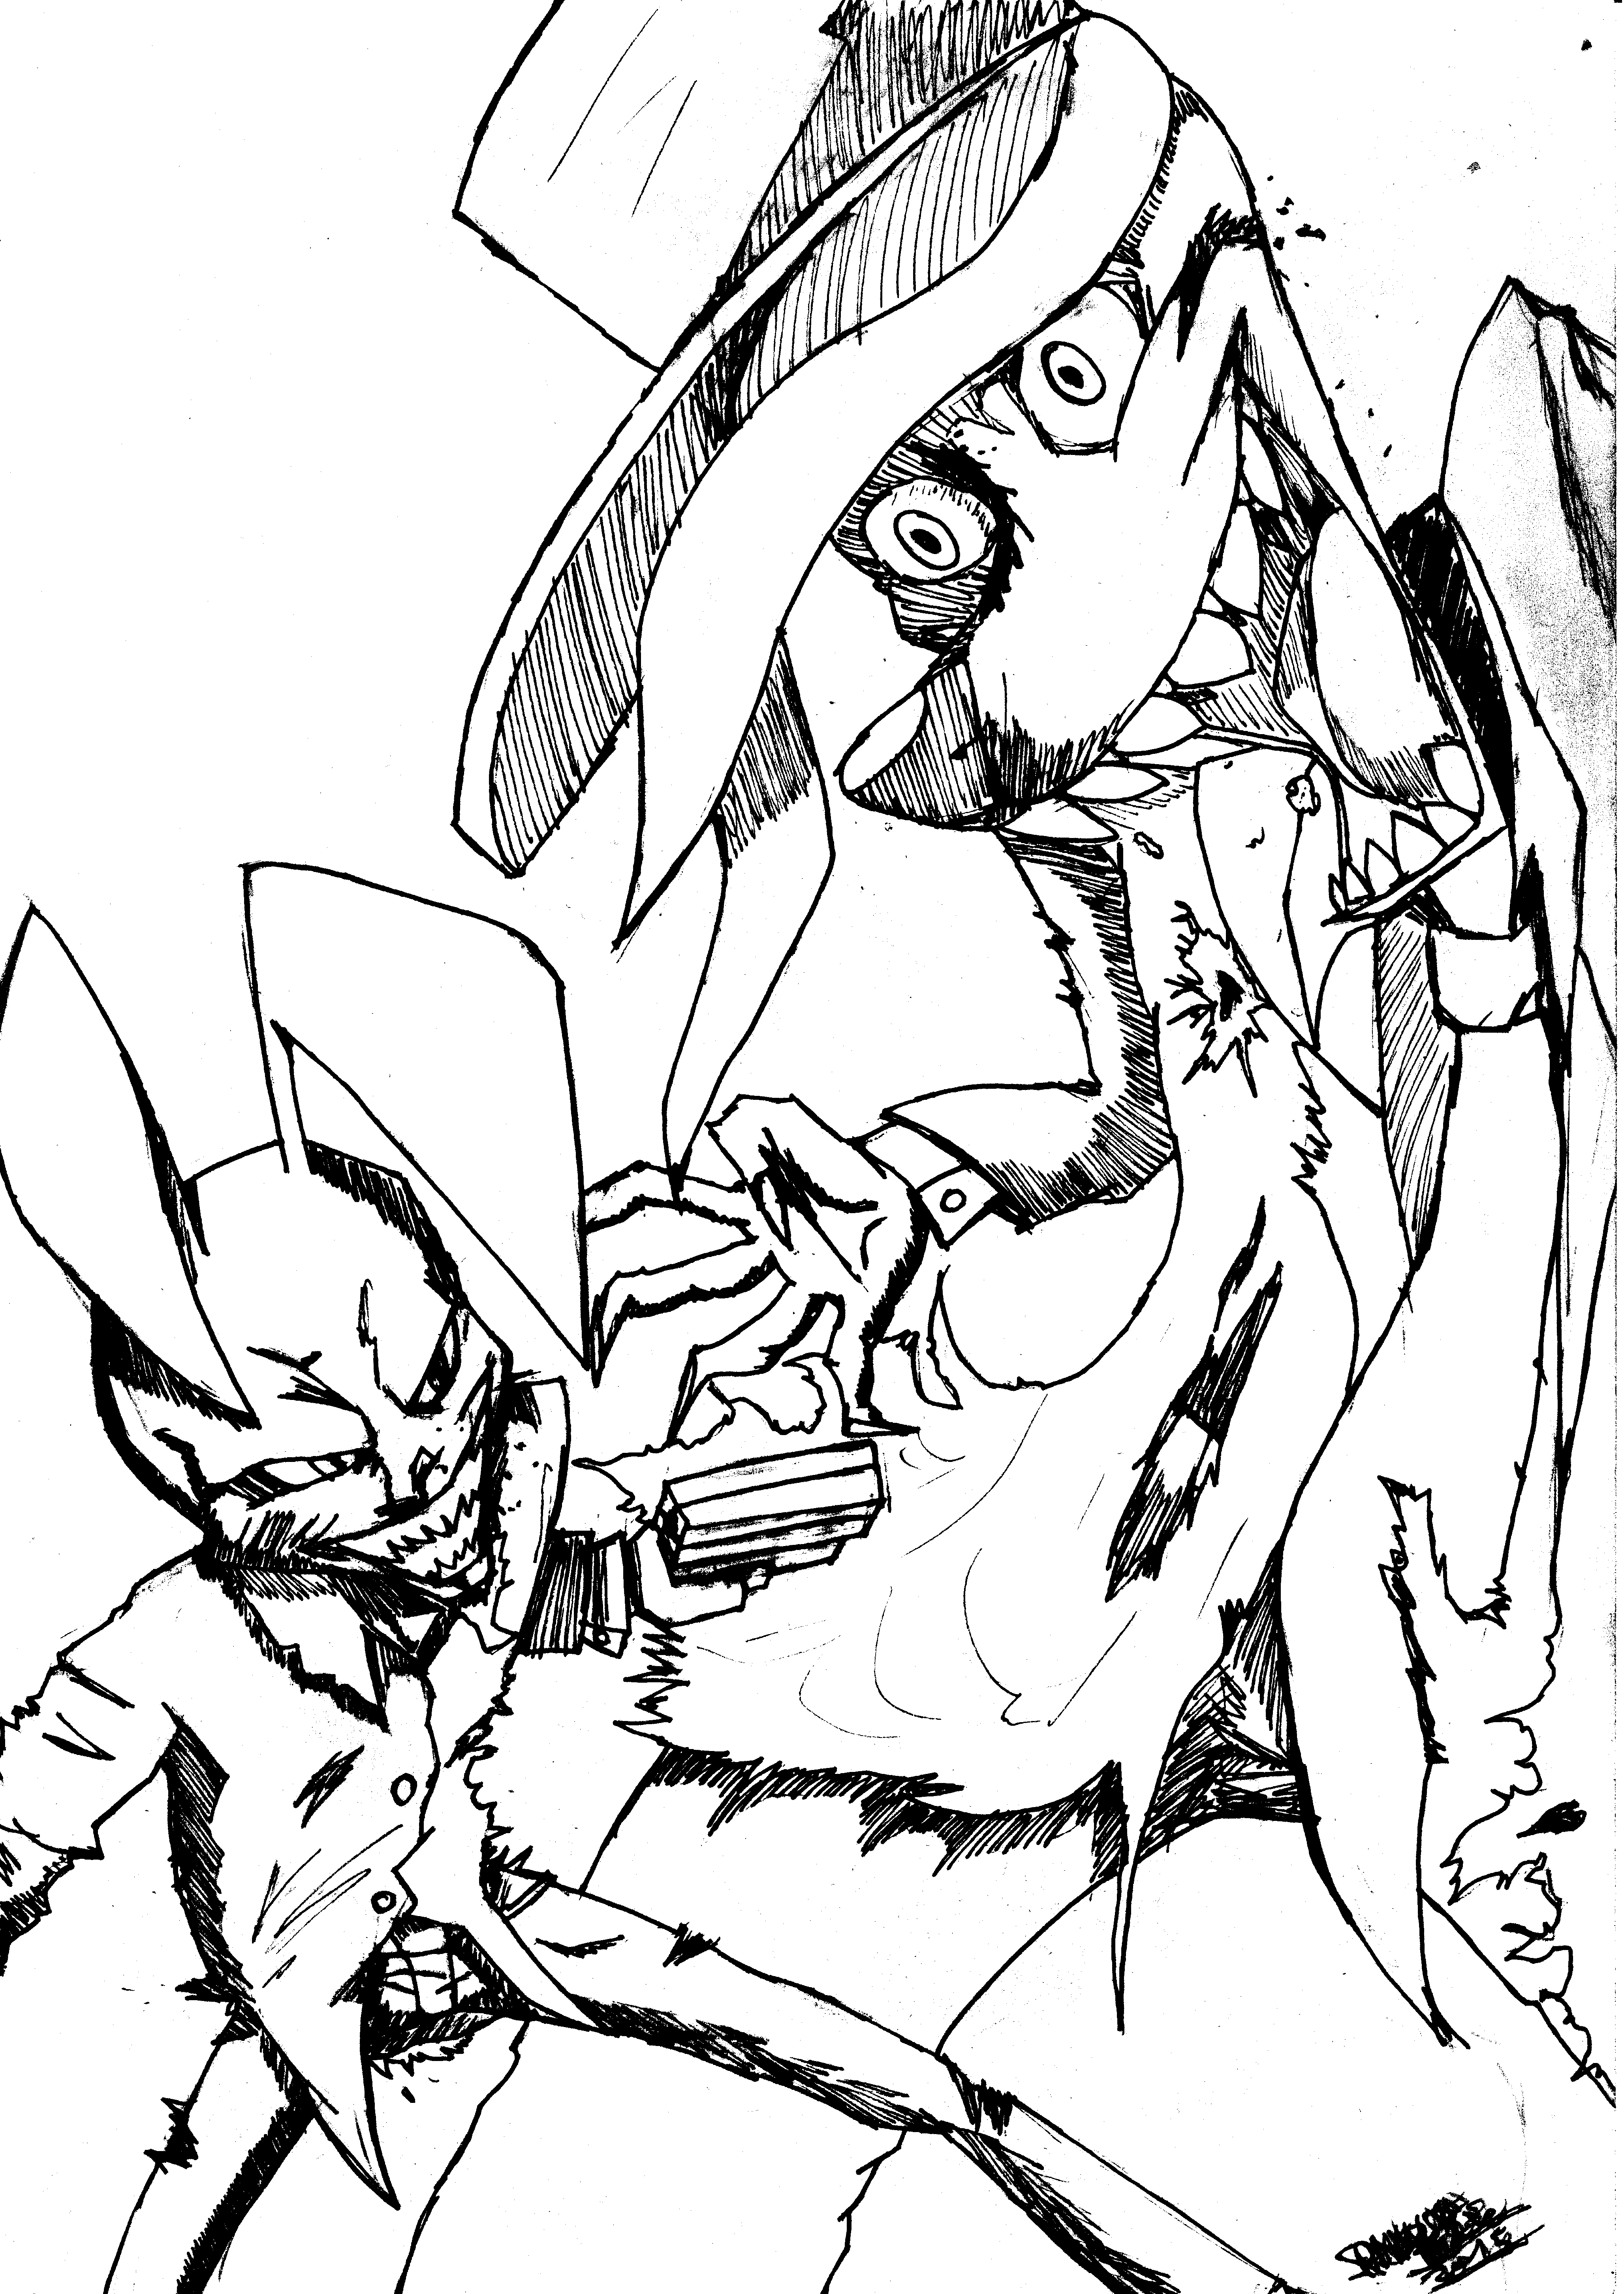 SH sketchbook page 74